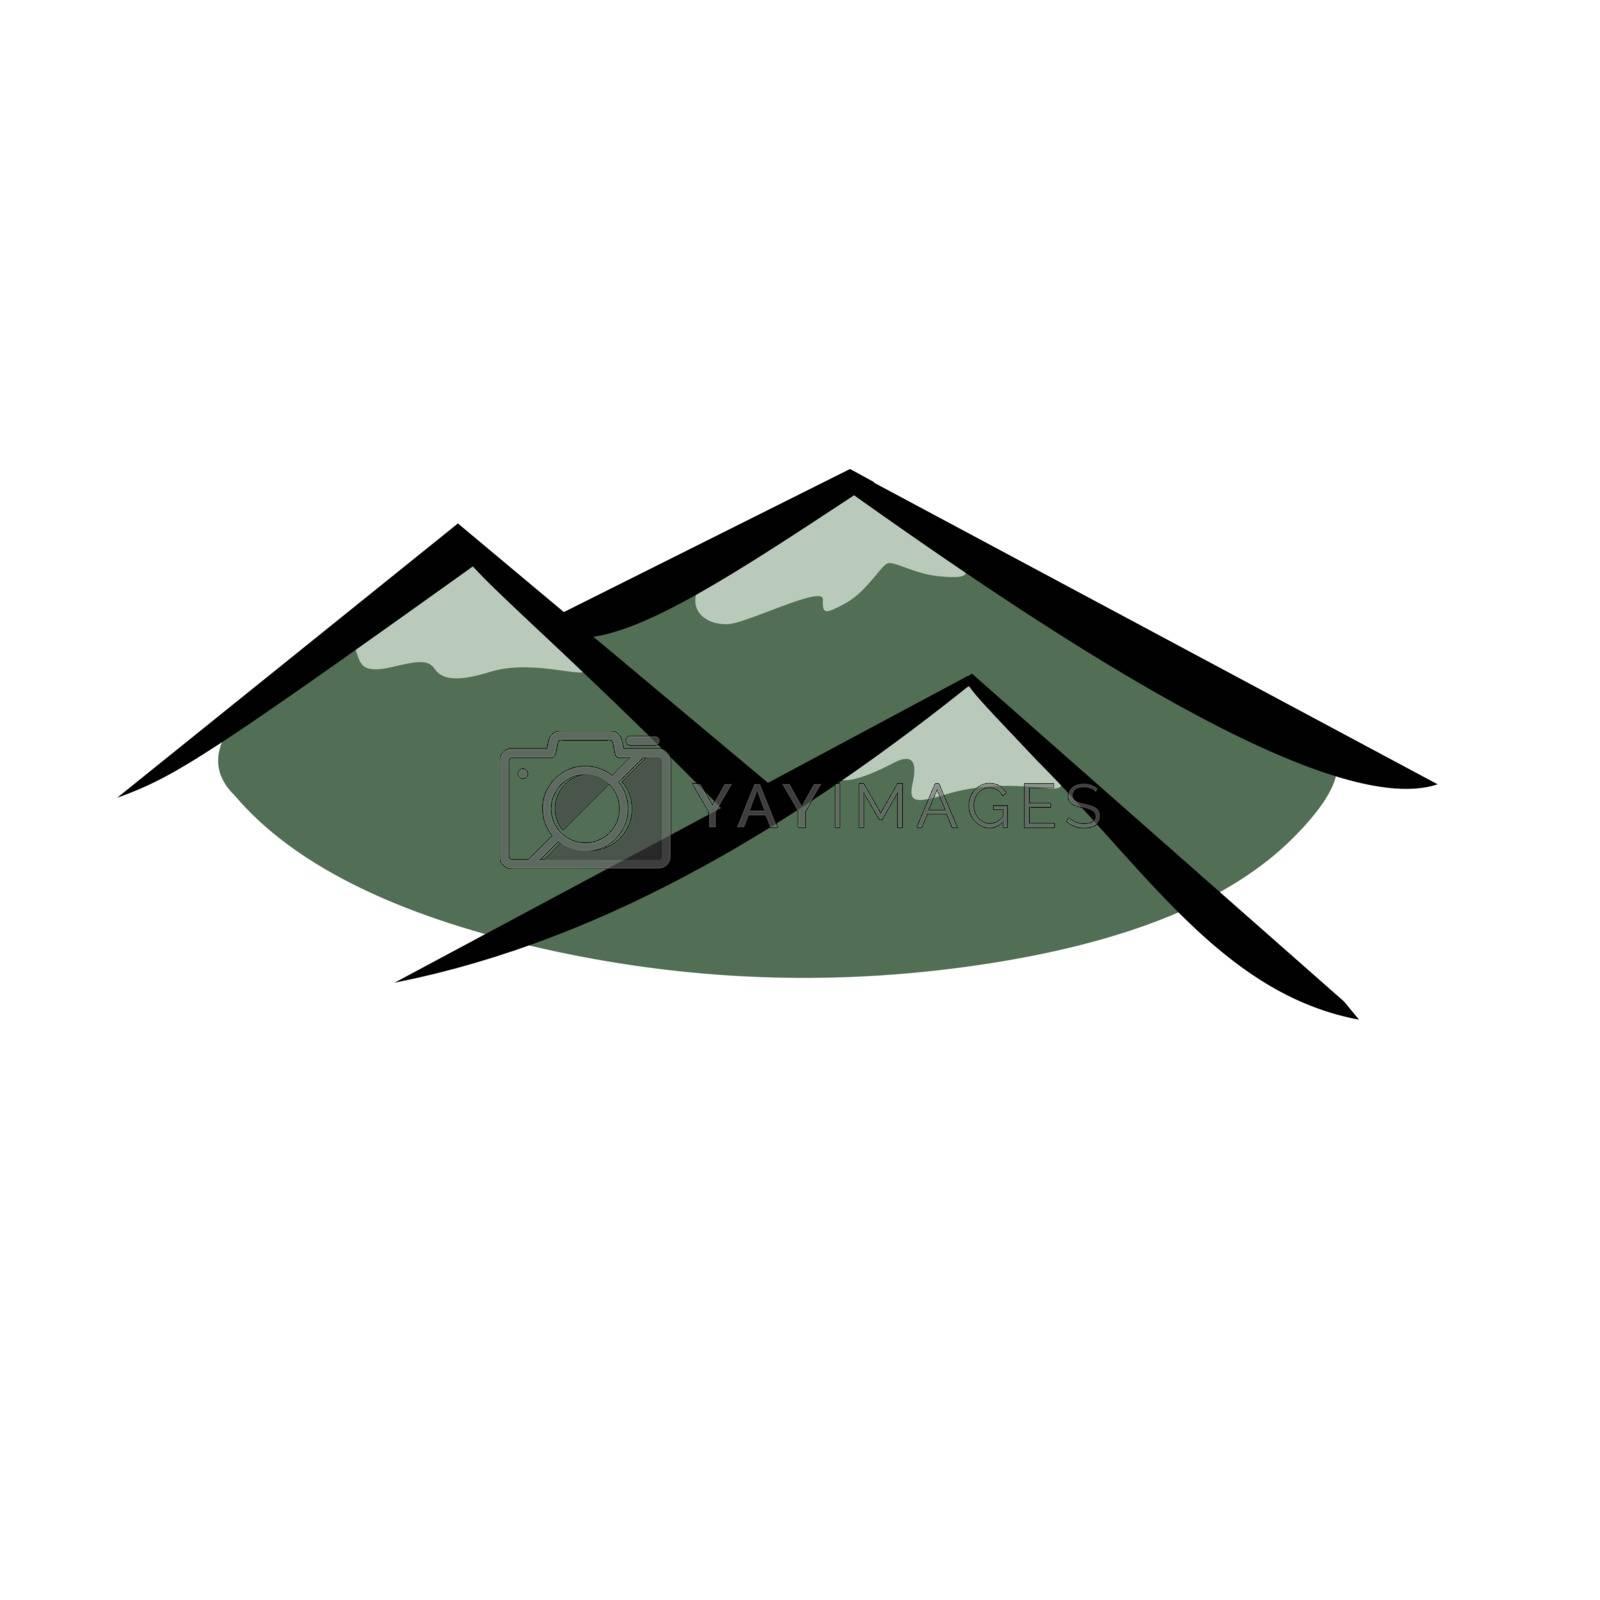 Vector illustration : Mountain logo on a white background.